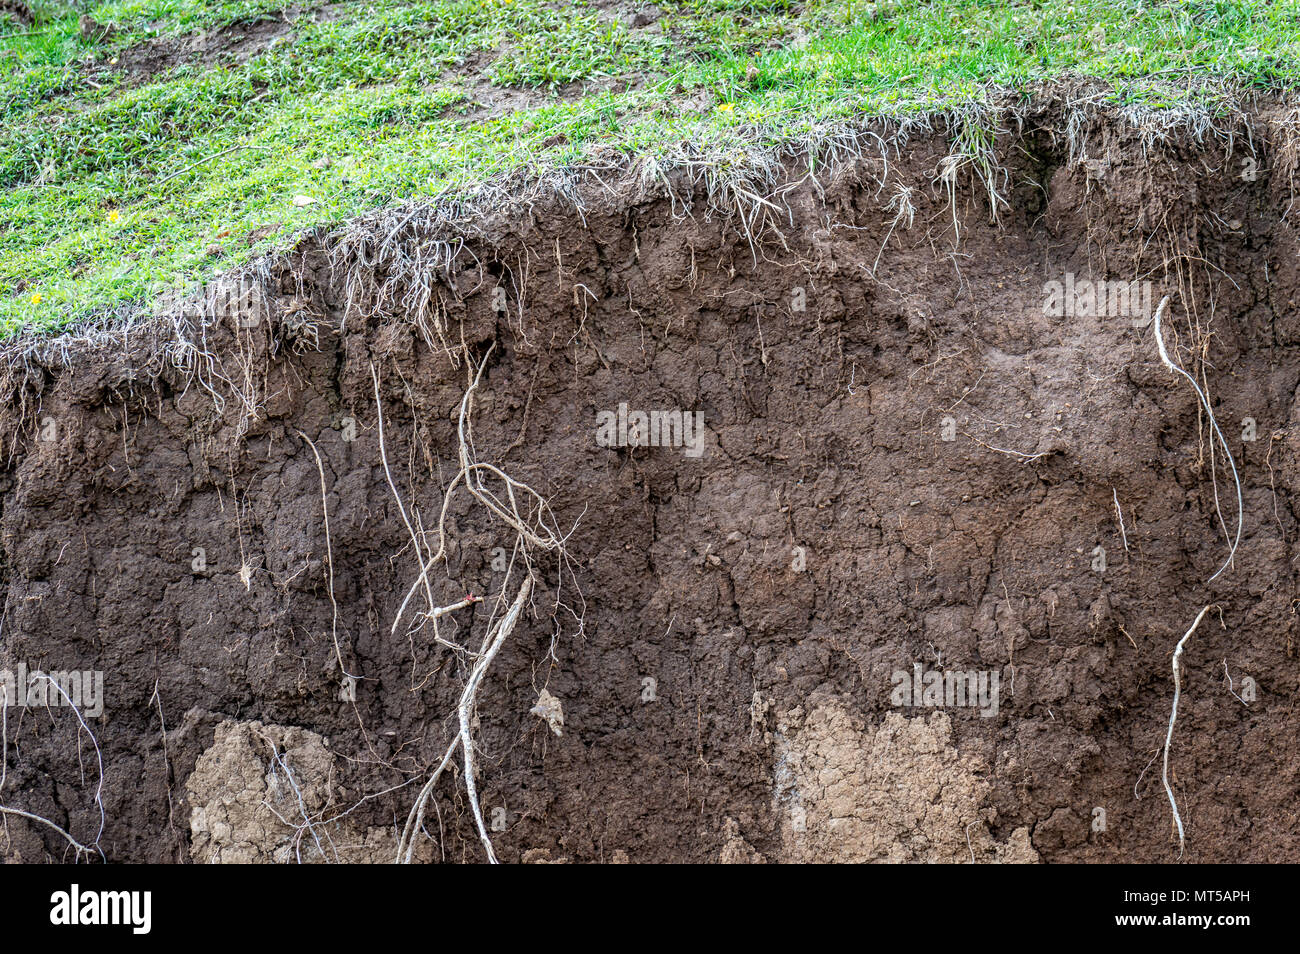 Layers of soil wet soil roots in soil soil profile soil zones grass growing on soil - Stock Image